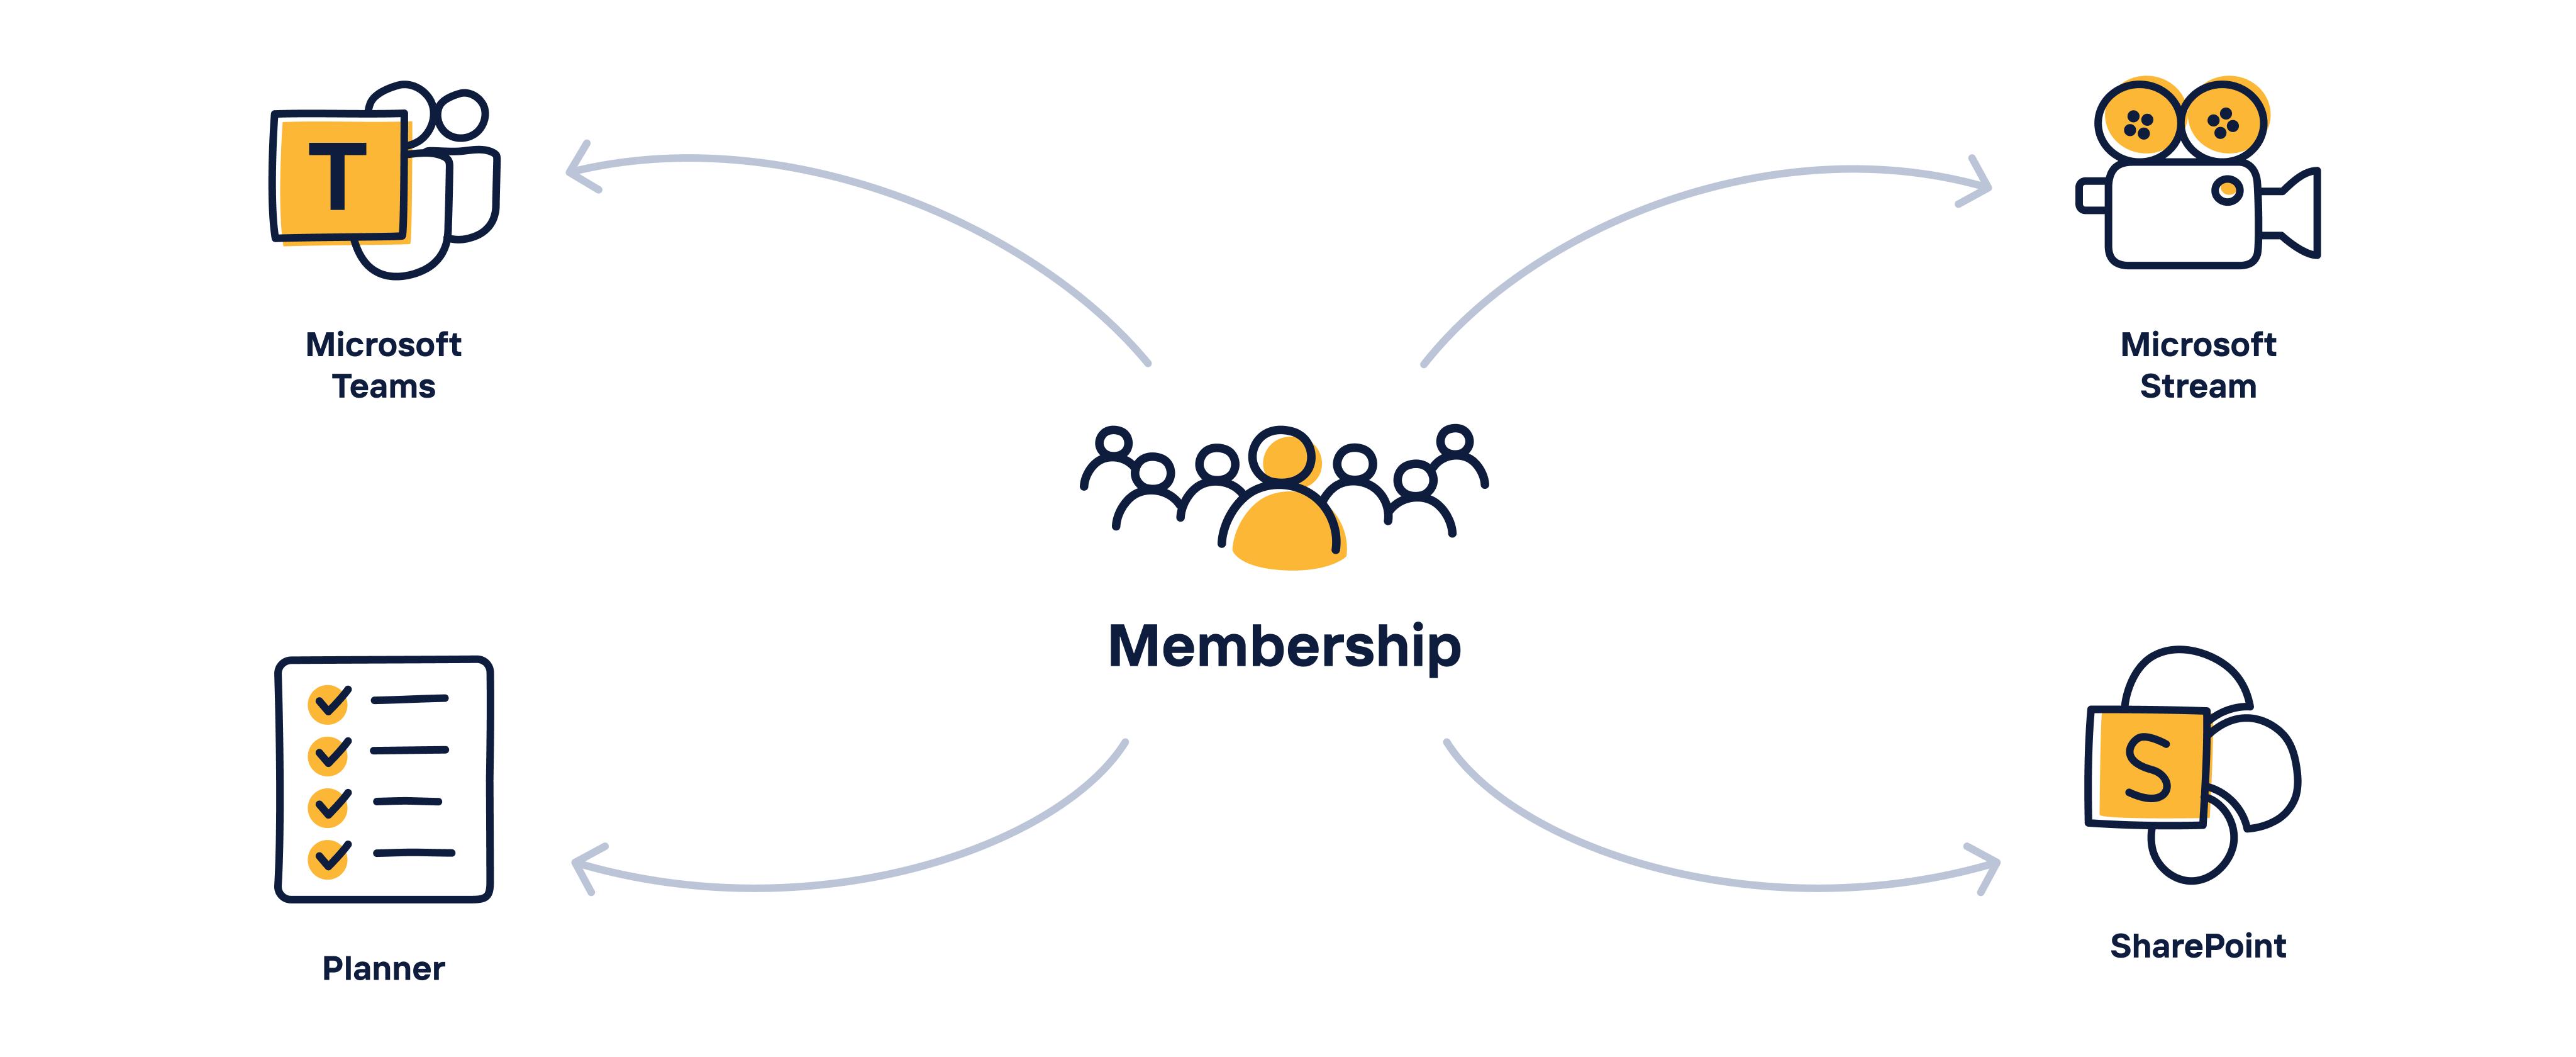 Microsoft 365 Groups Membership Services